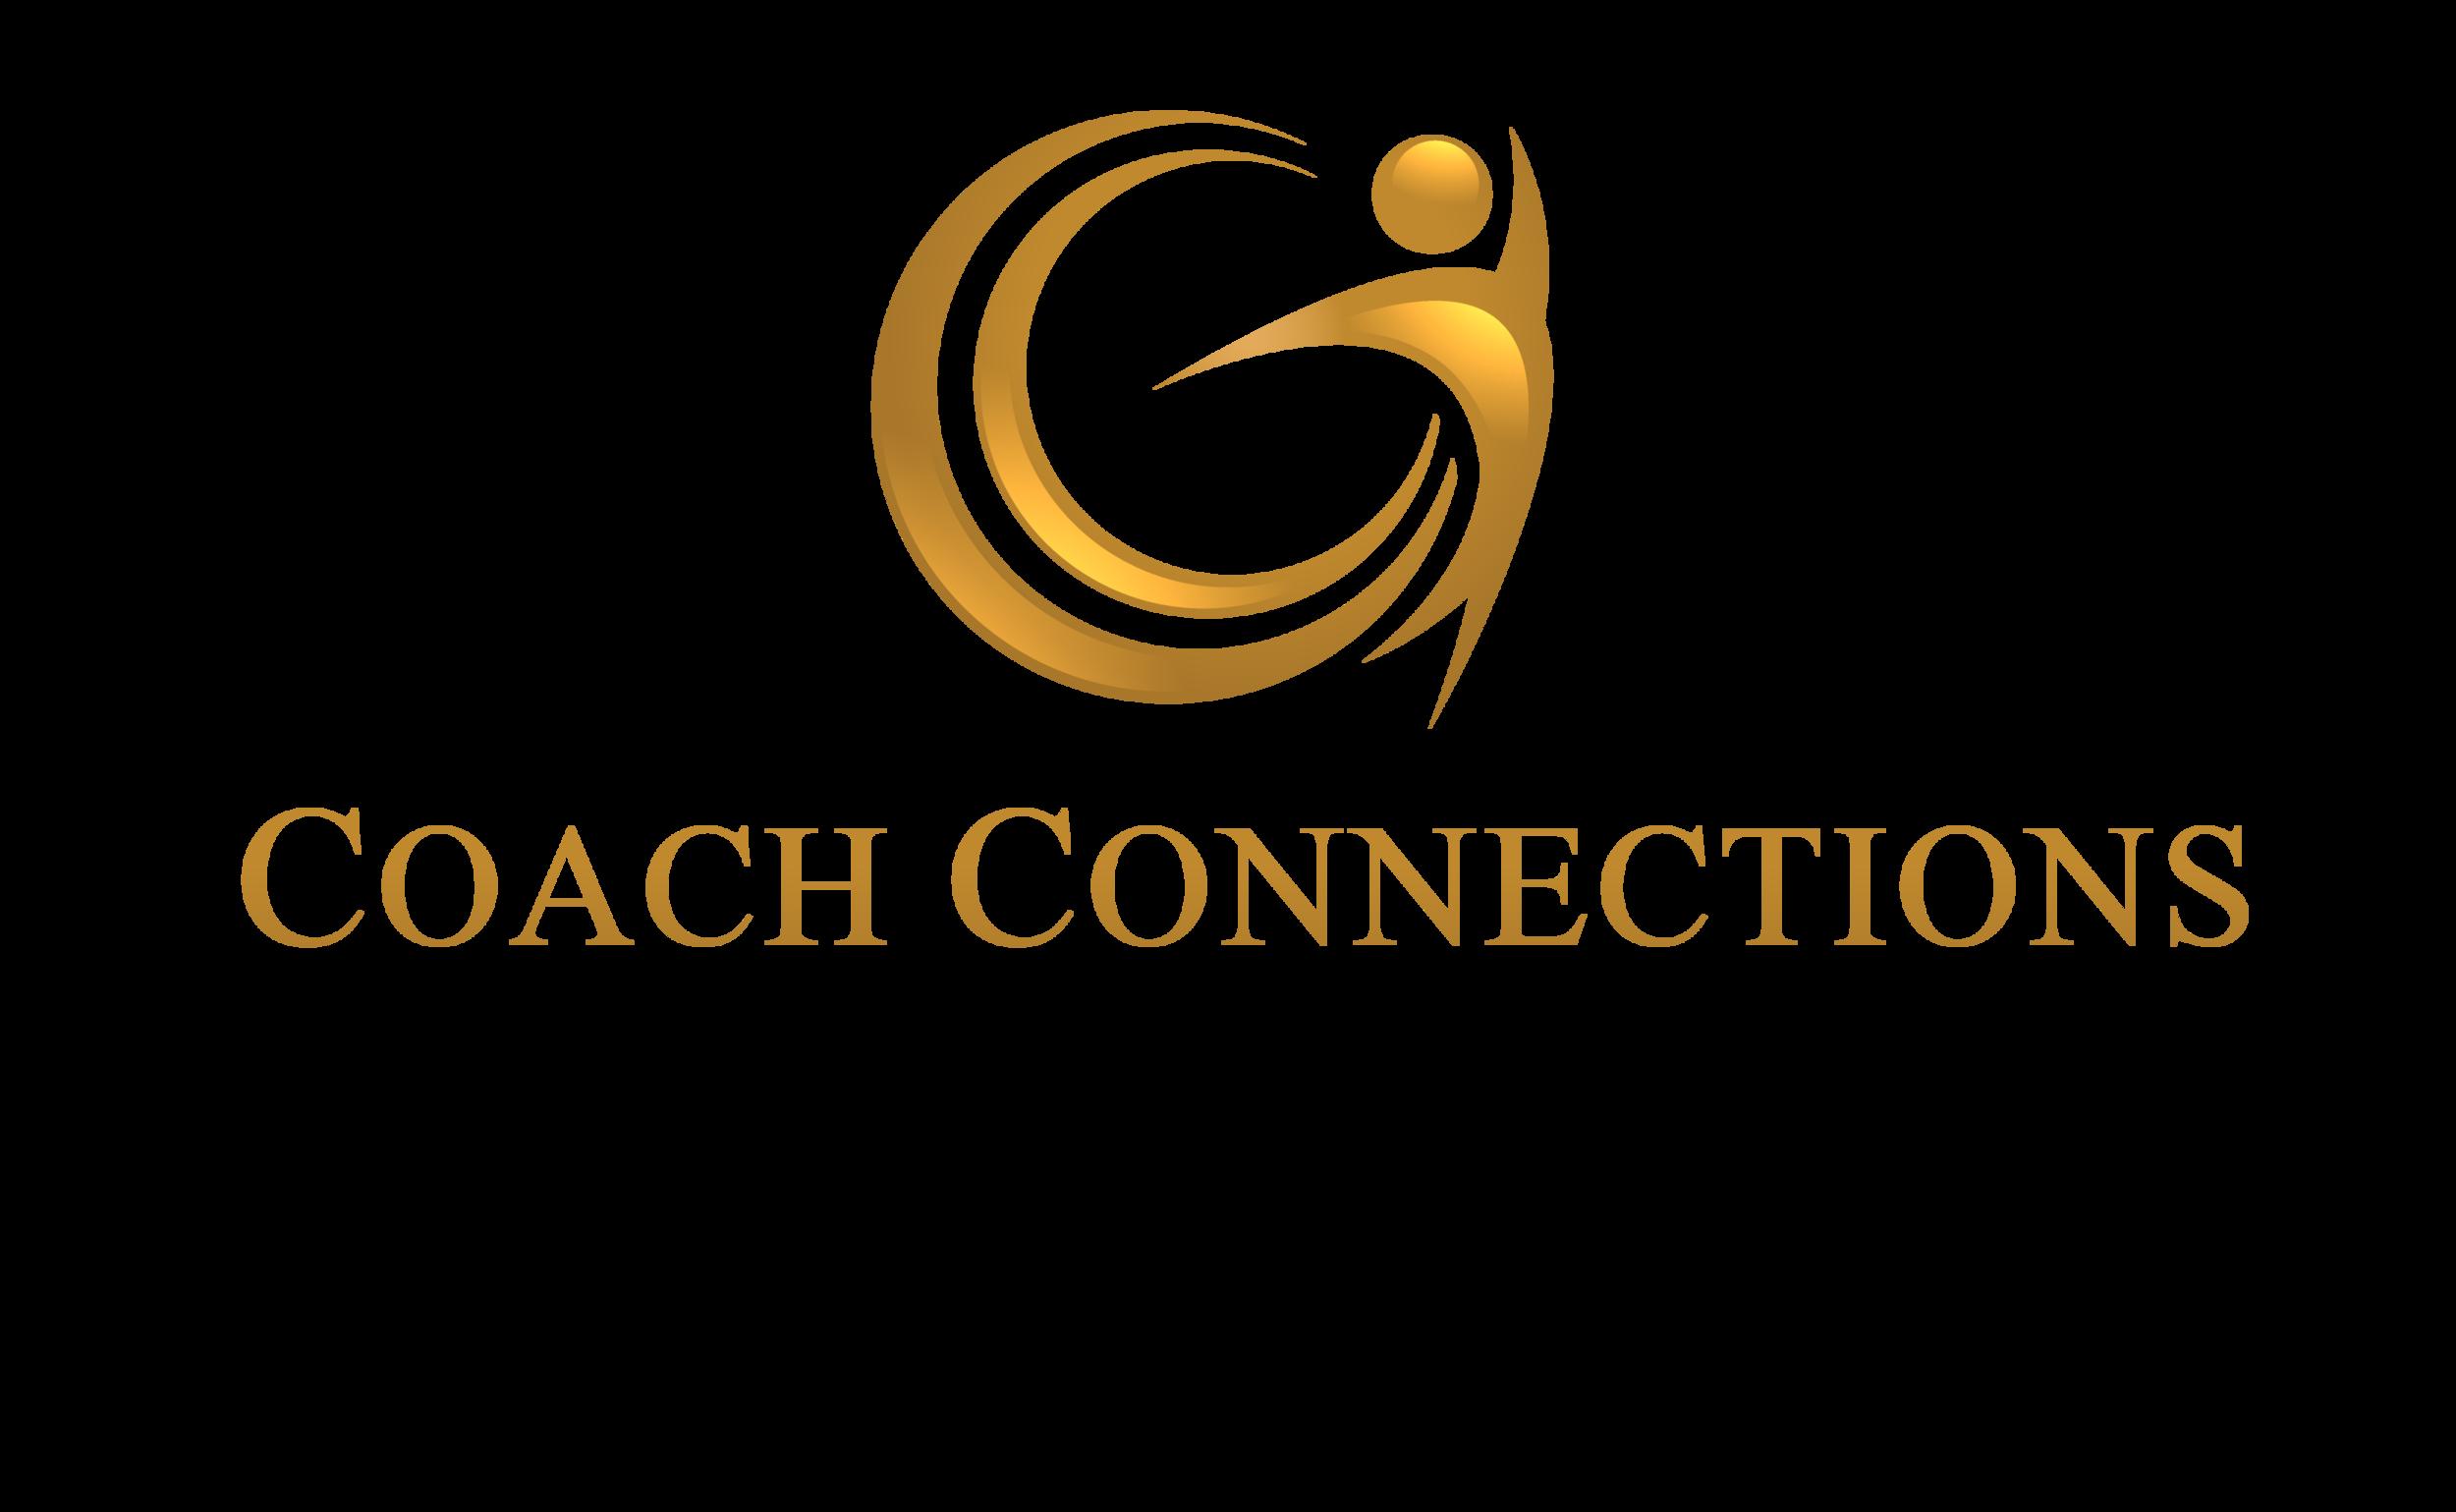 coachconnections.png